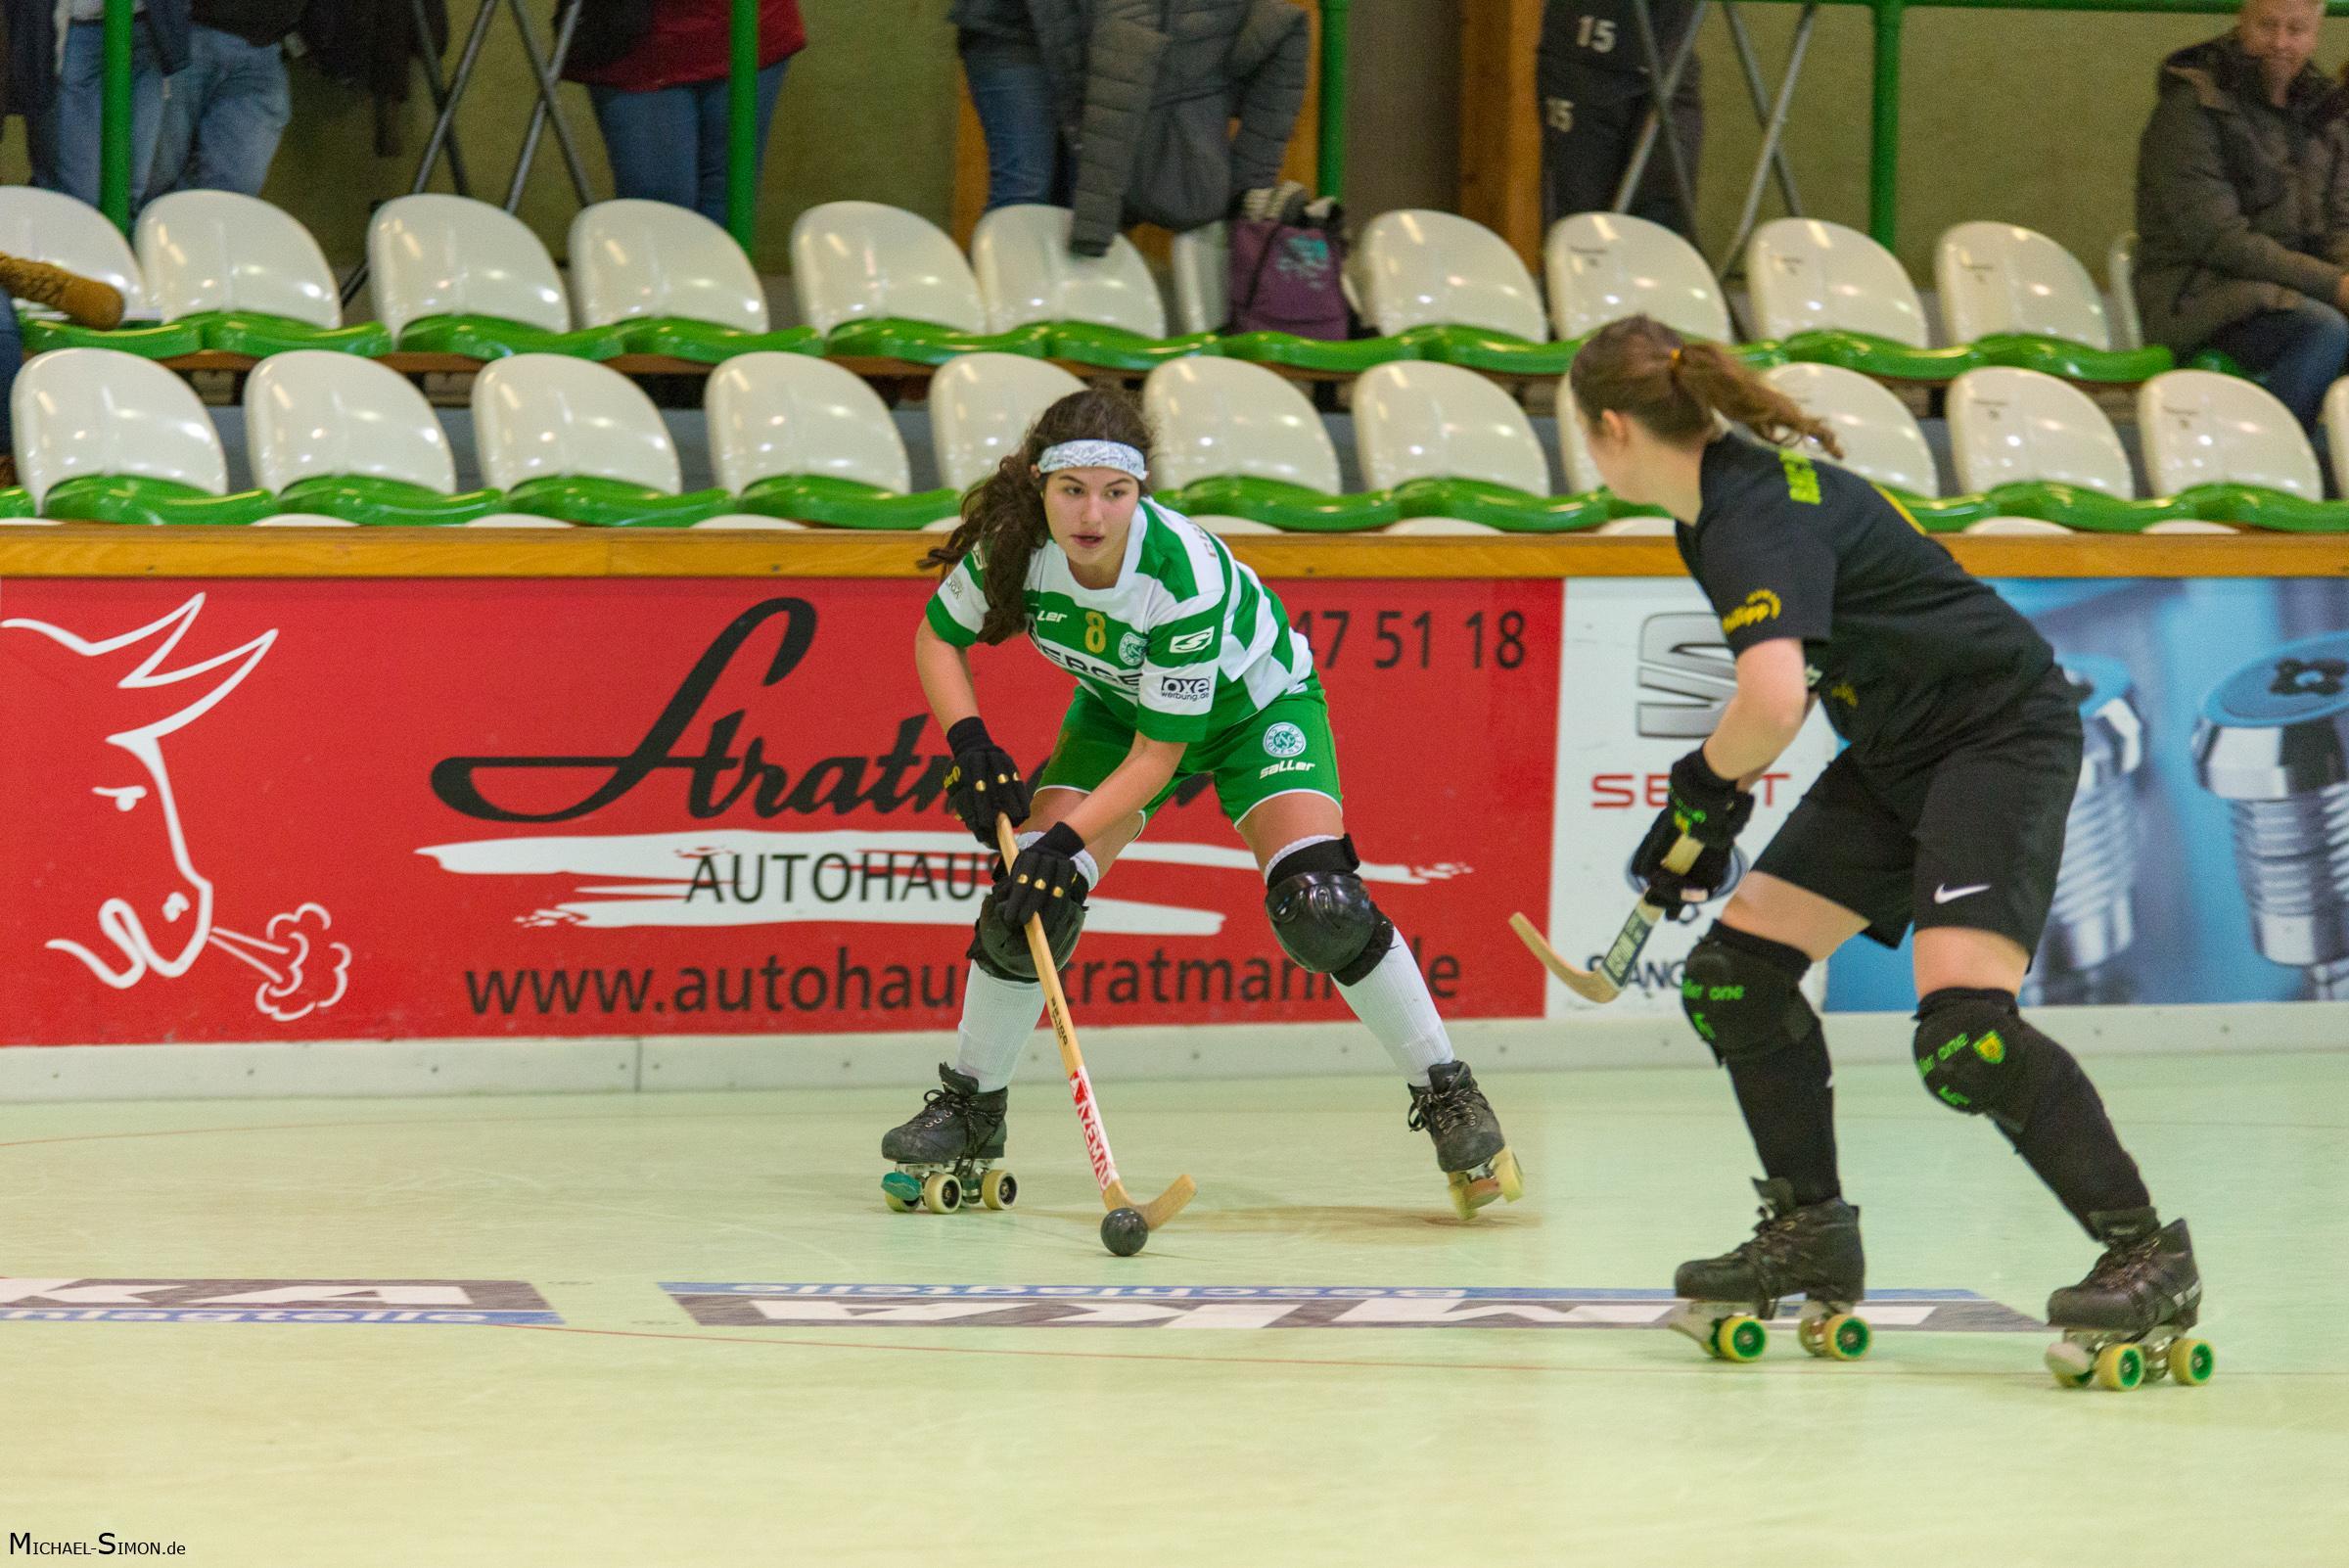 RSC Cronenberg Rollhockey Spieltag Bundesliga Damen 20.01.2018